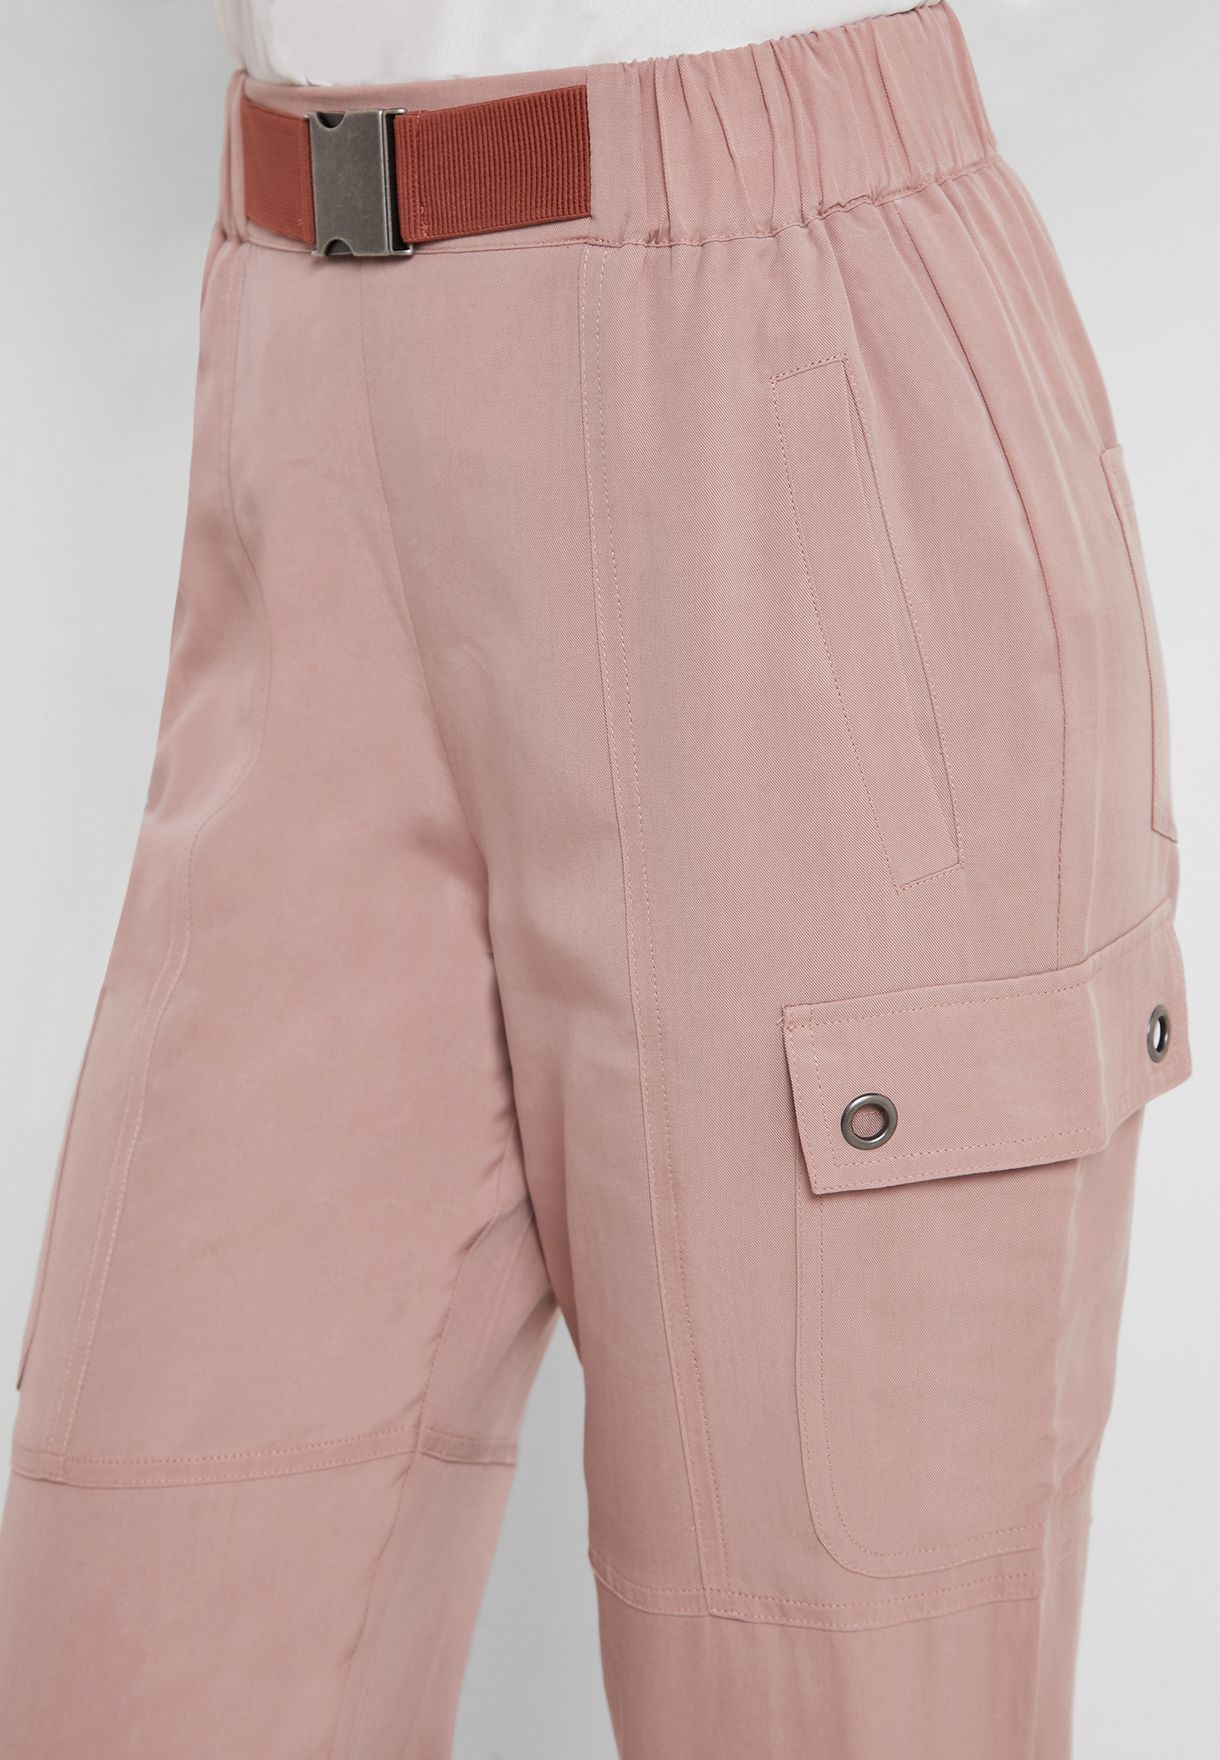 Buckle Detail High Waist Pants